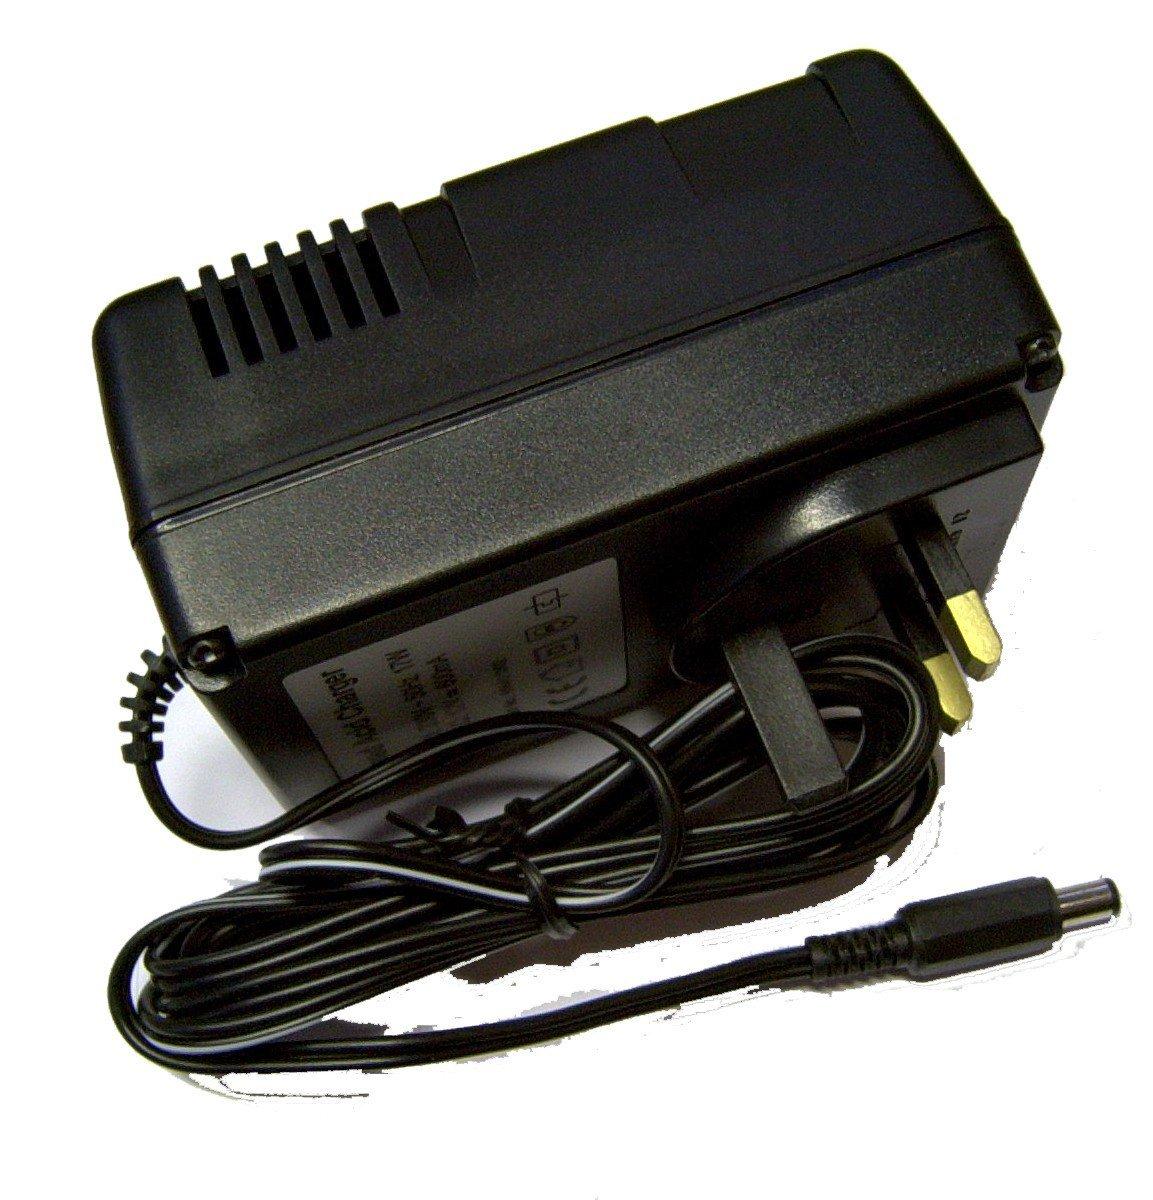 Philadelphia Scientific: HydroFill Charger 3-Pin UK 220VAC/12VDC 2.1mm (With EU Plug Adapter)